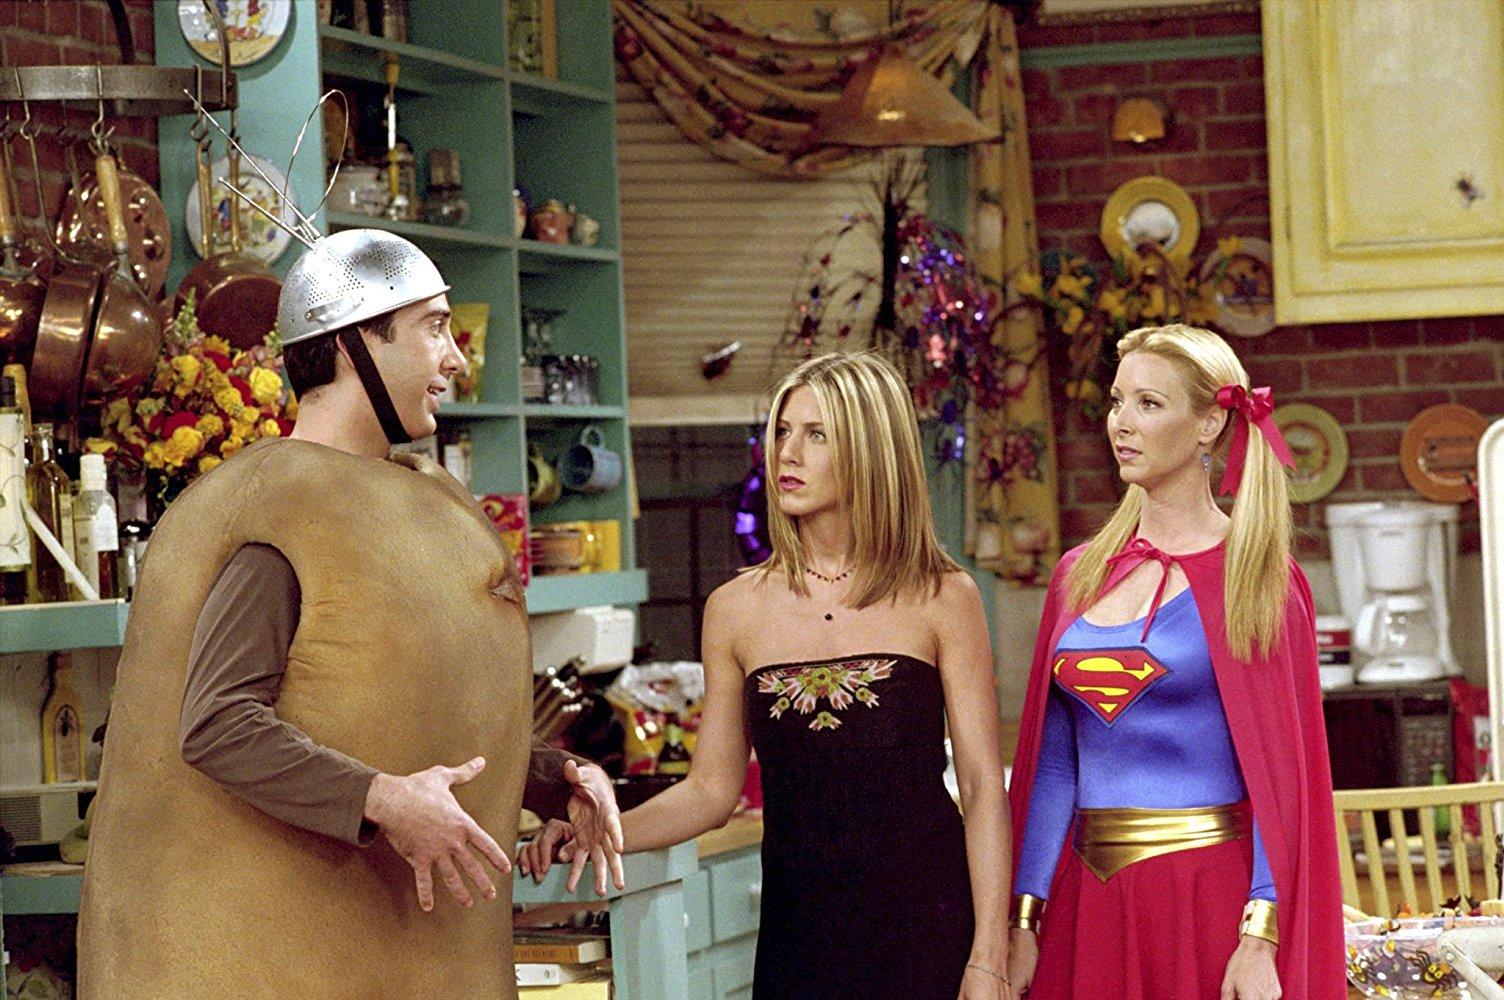 Ross, Rachel and Phoebe dressed in Halloween costumes